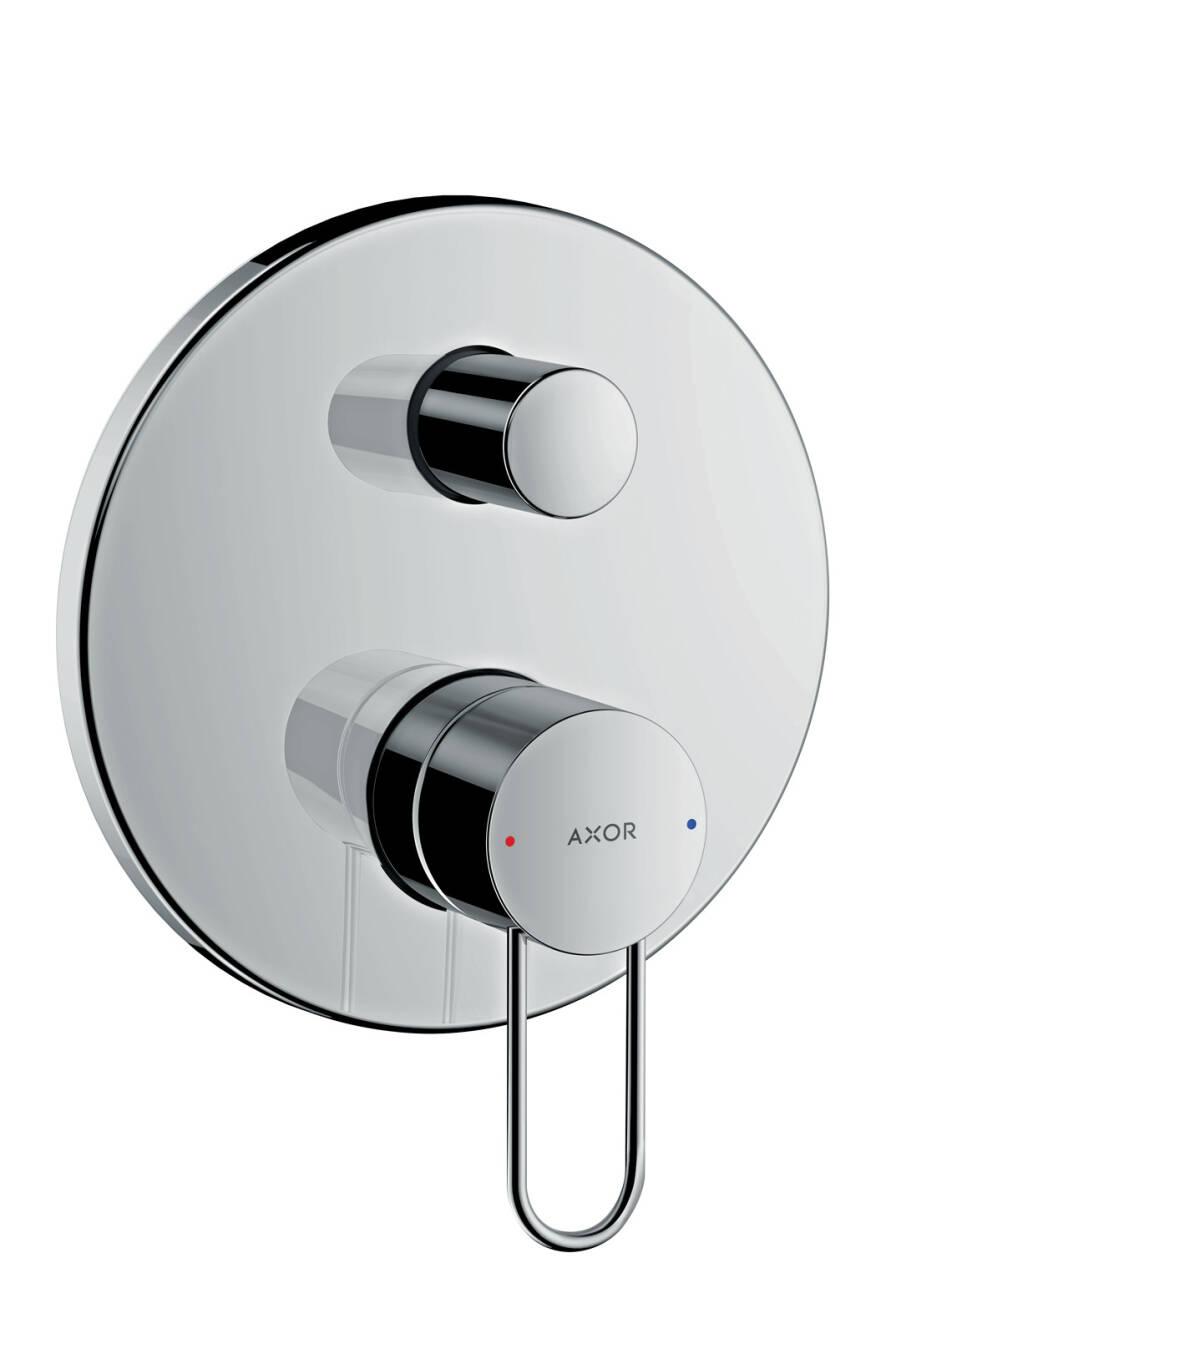 axor uno bath mixers 2 outlets chrome 38428000. Black Bedroom Furniture Sets. Home Design Ideas